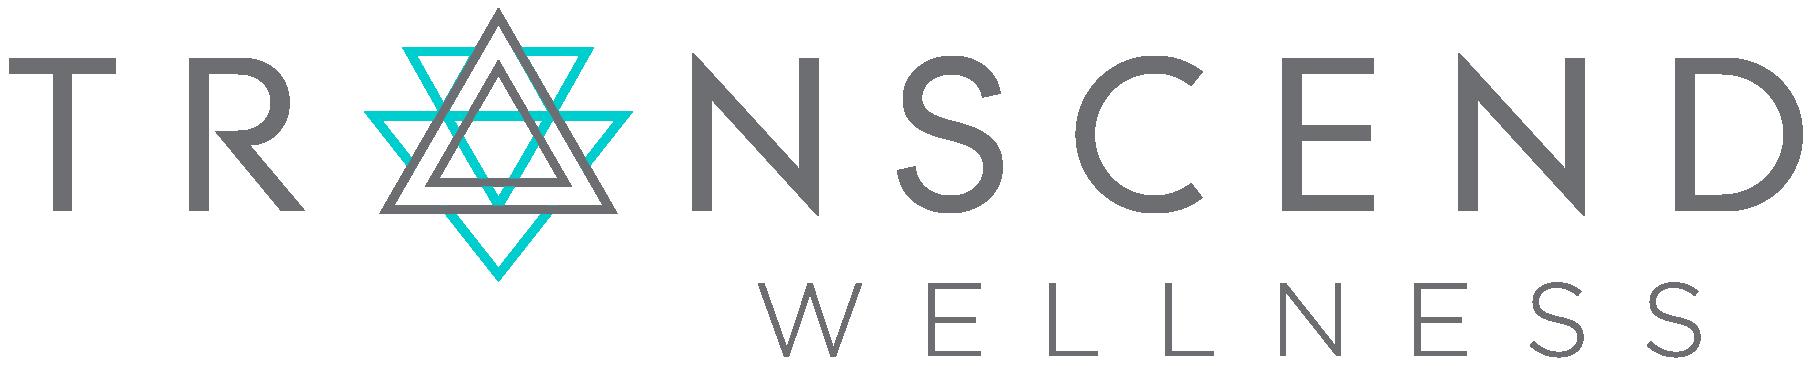 Transcend Wellness Press Kit Transcend Wellness